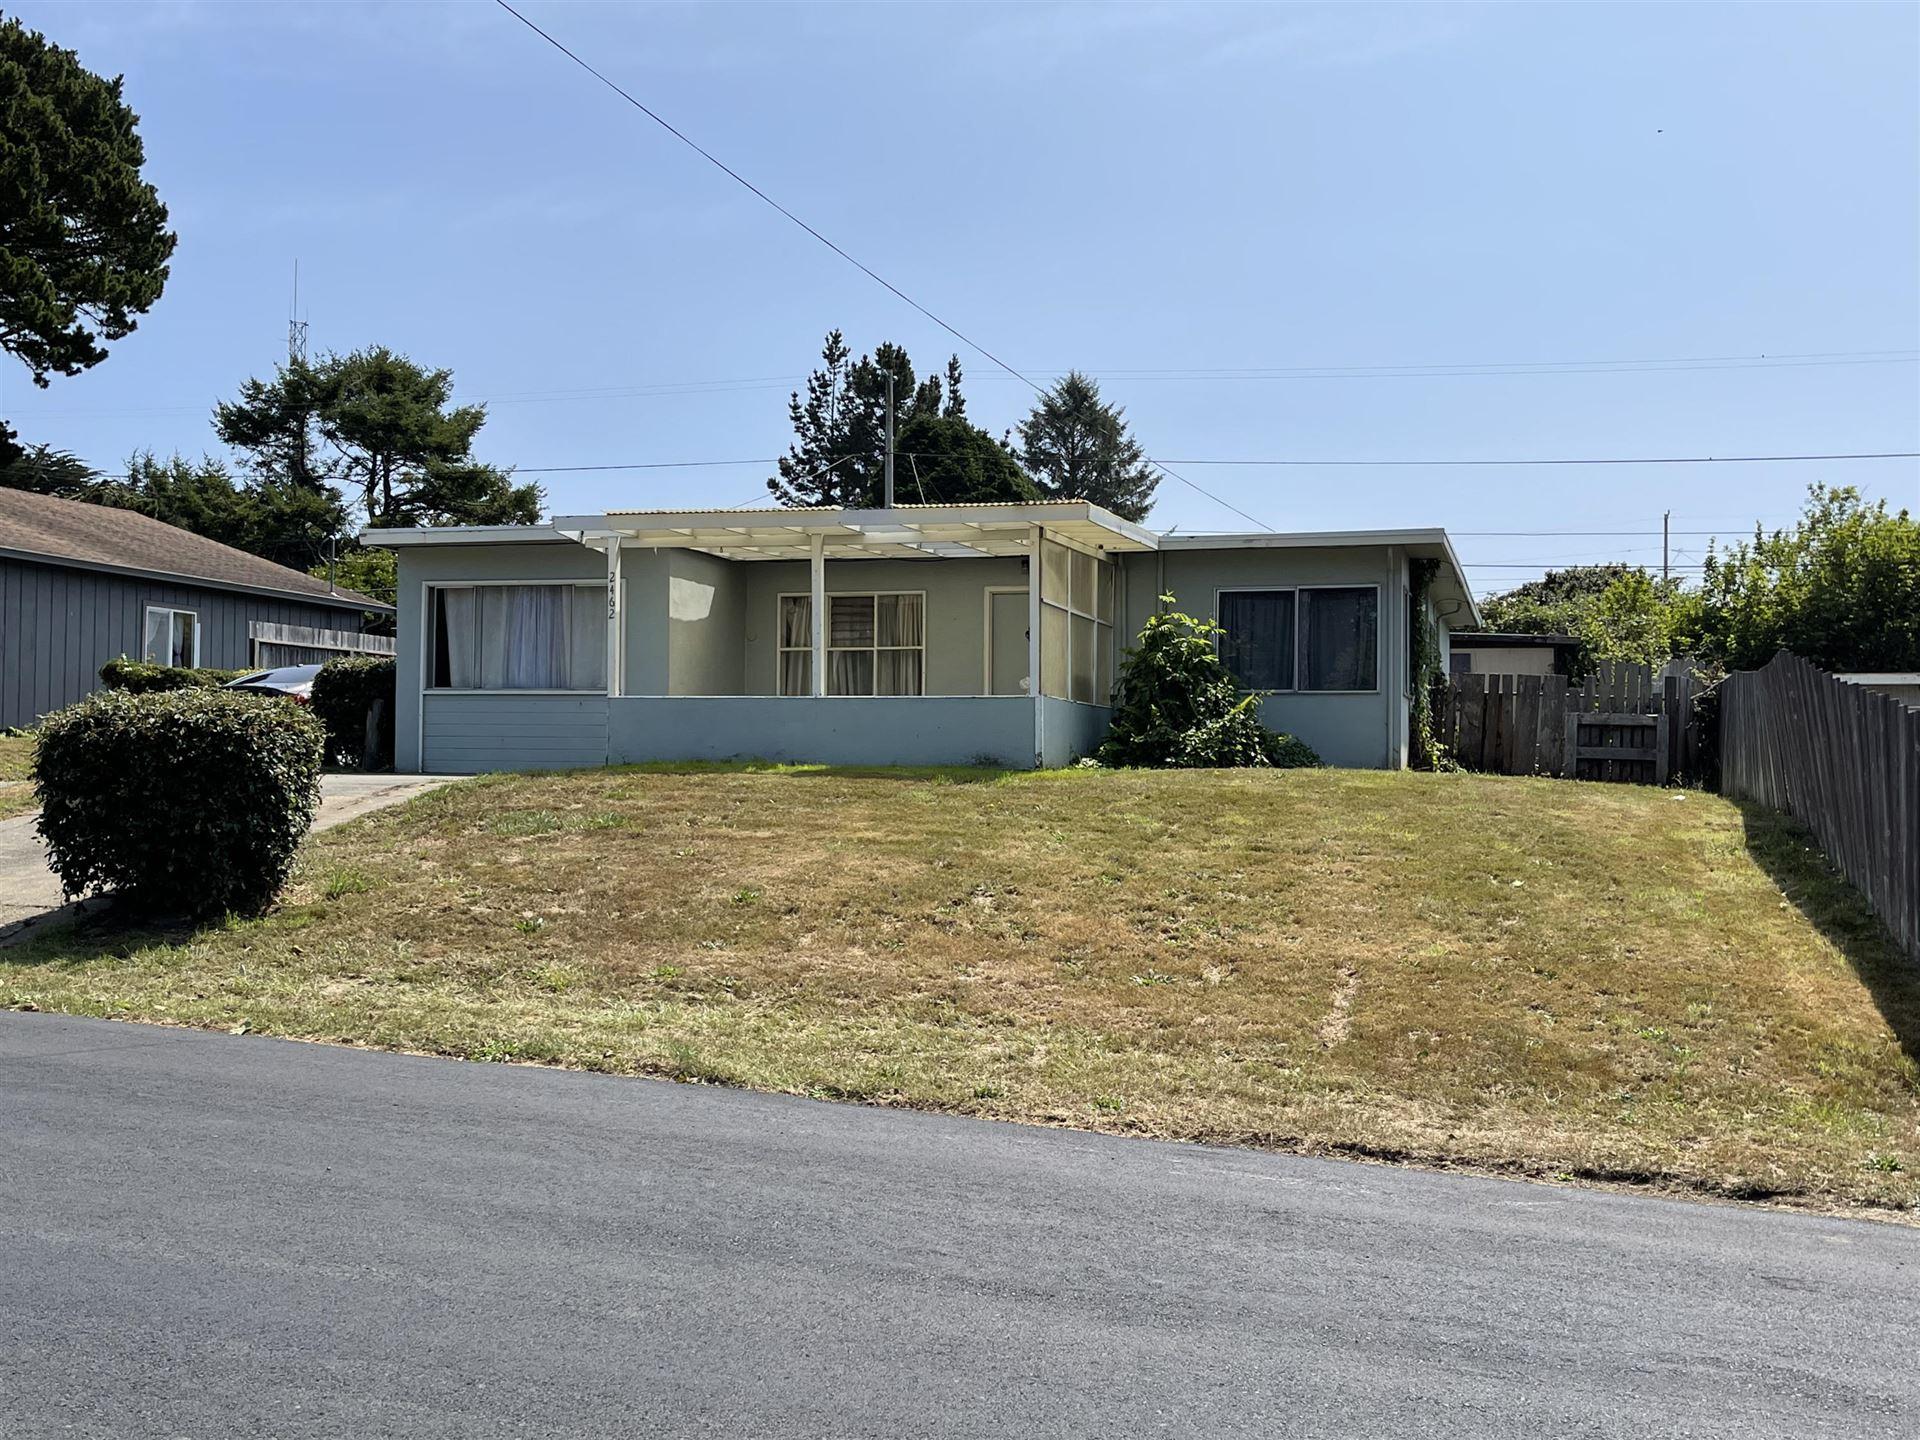 2462 Donna Drive, Eureka, CA 95503 - MLS#: 259883